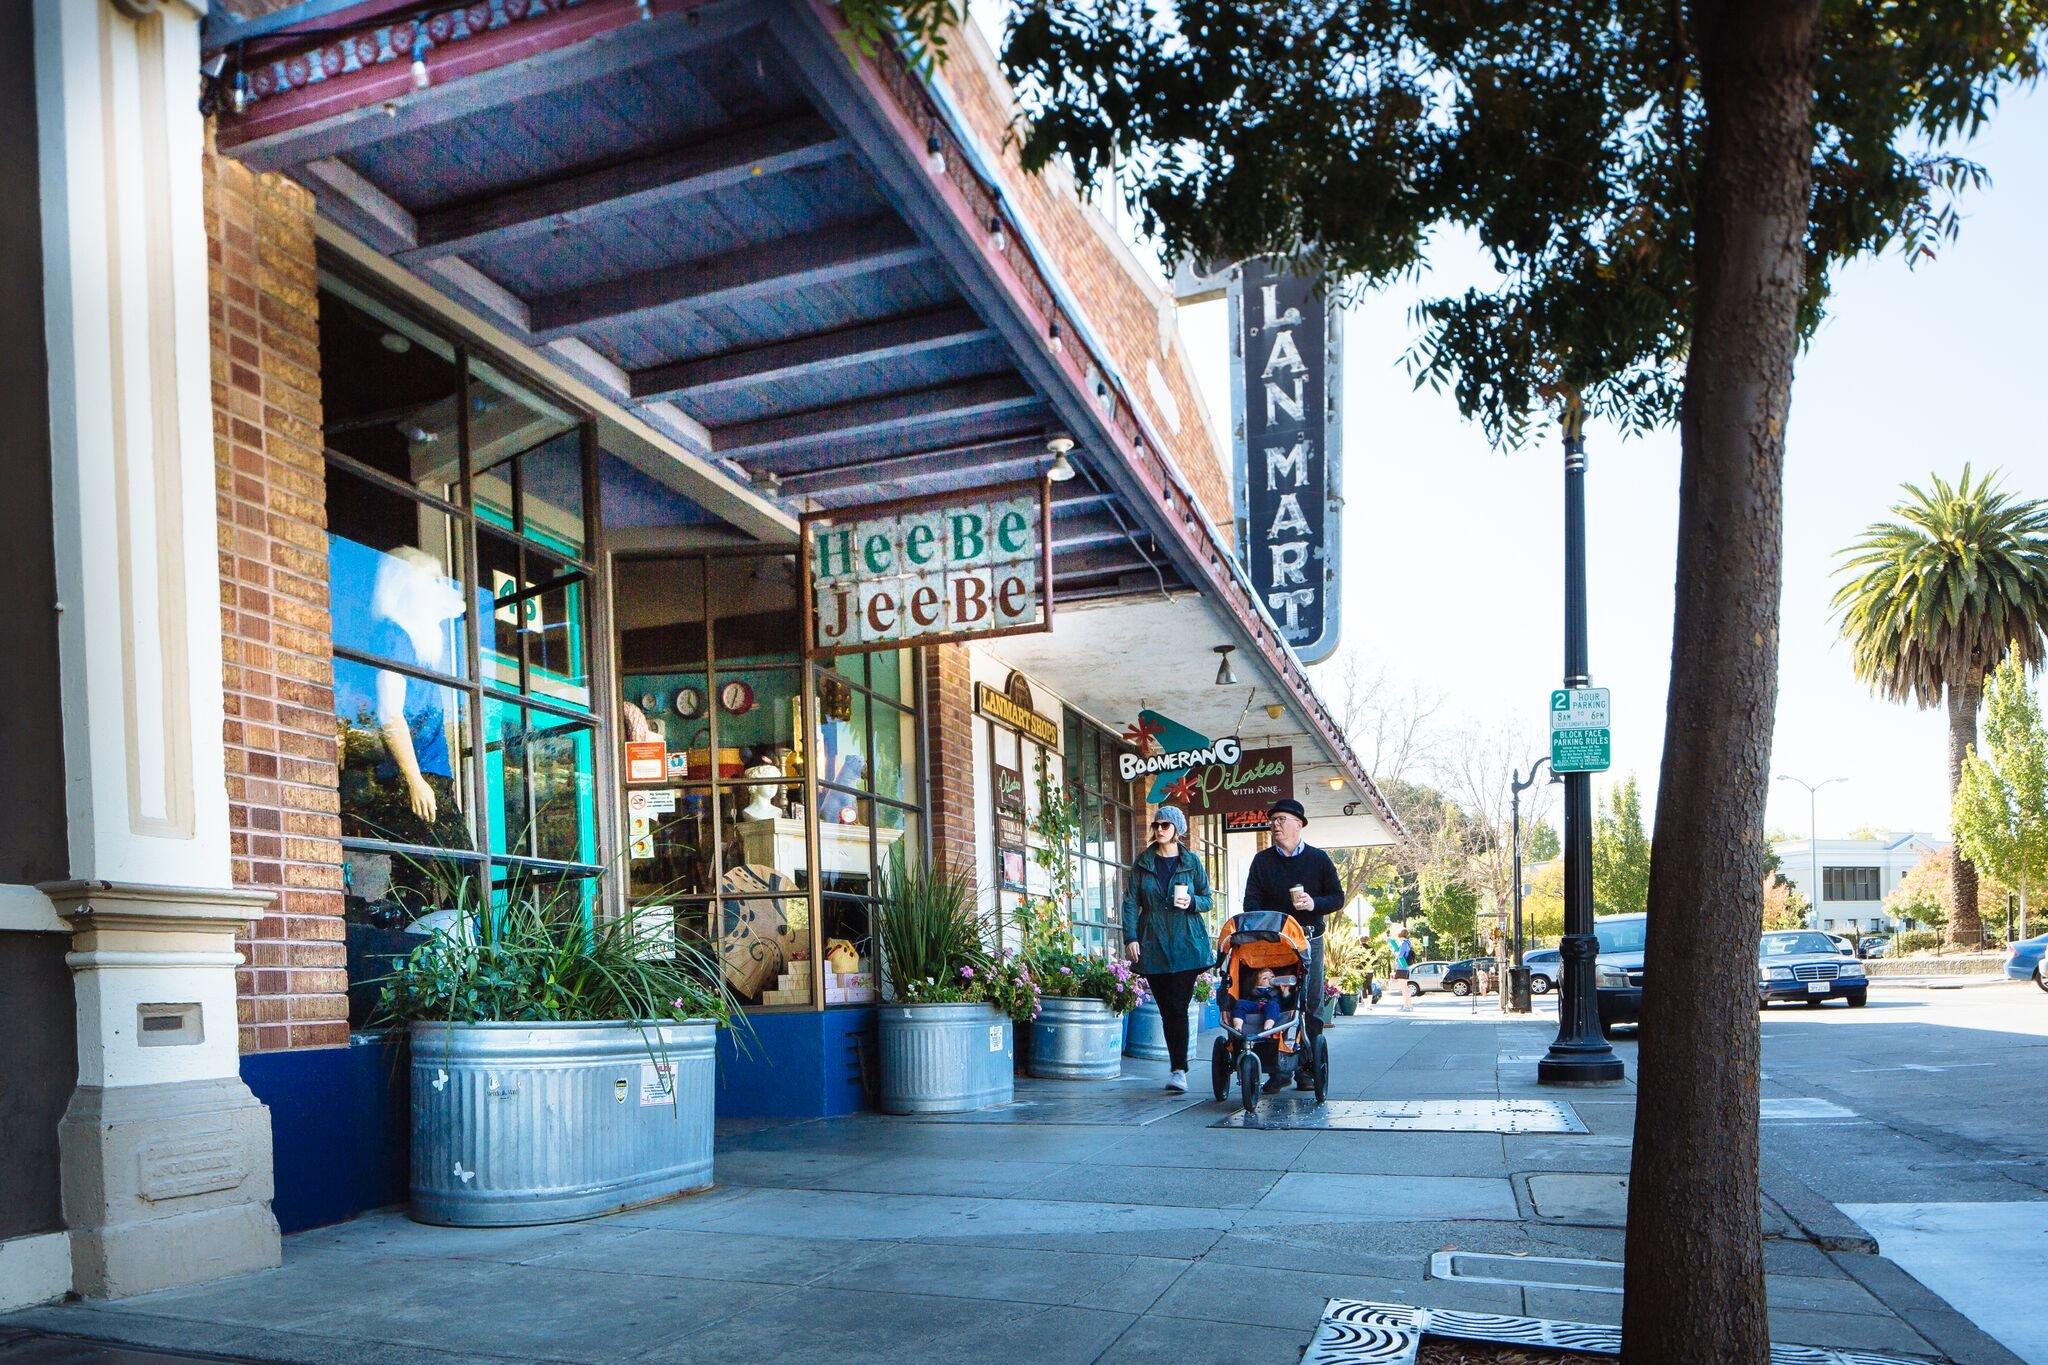 https://0201.nccdn.net/1_2/000/000/095/388/Petaluma-Visitors-Program---Locations---2016-m.woolsey-5-2048x1365.jpg